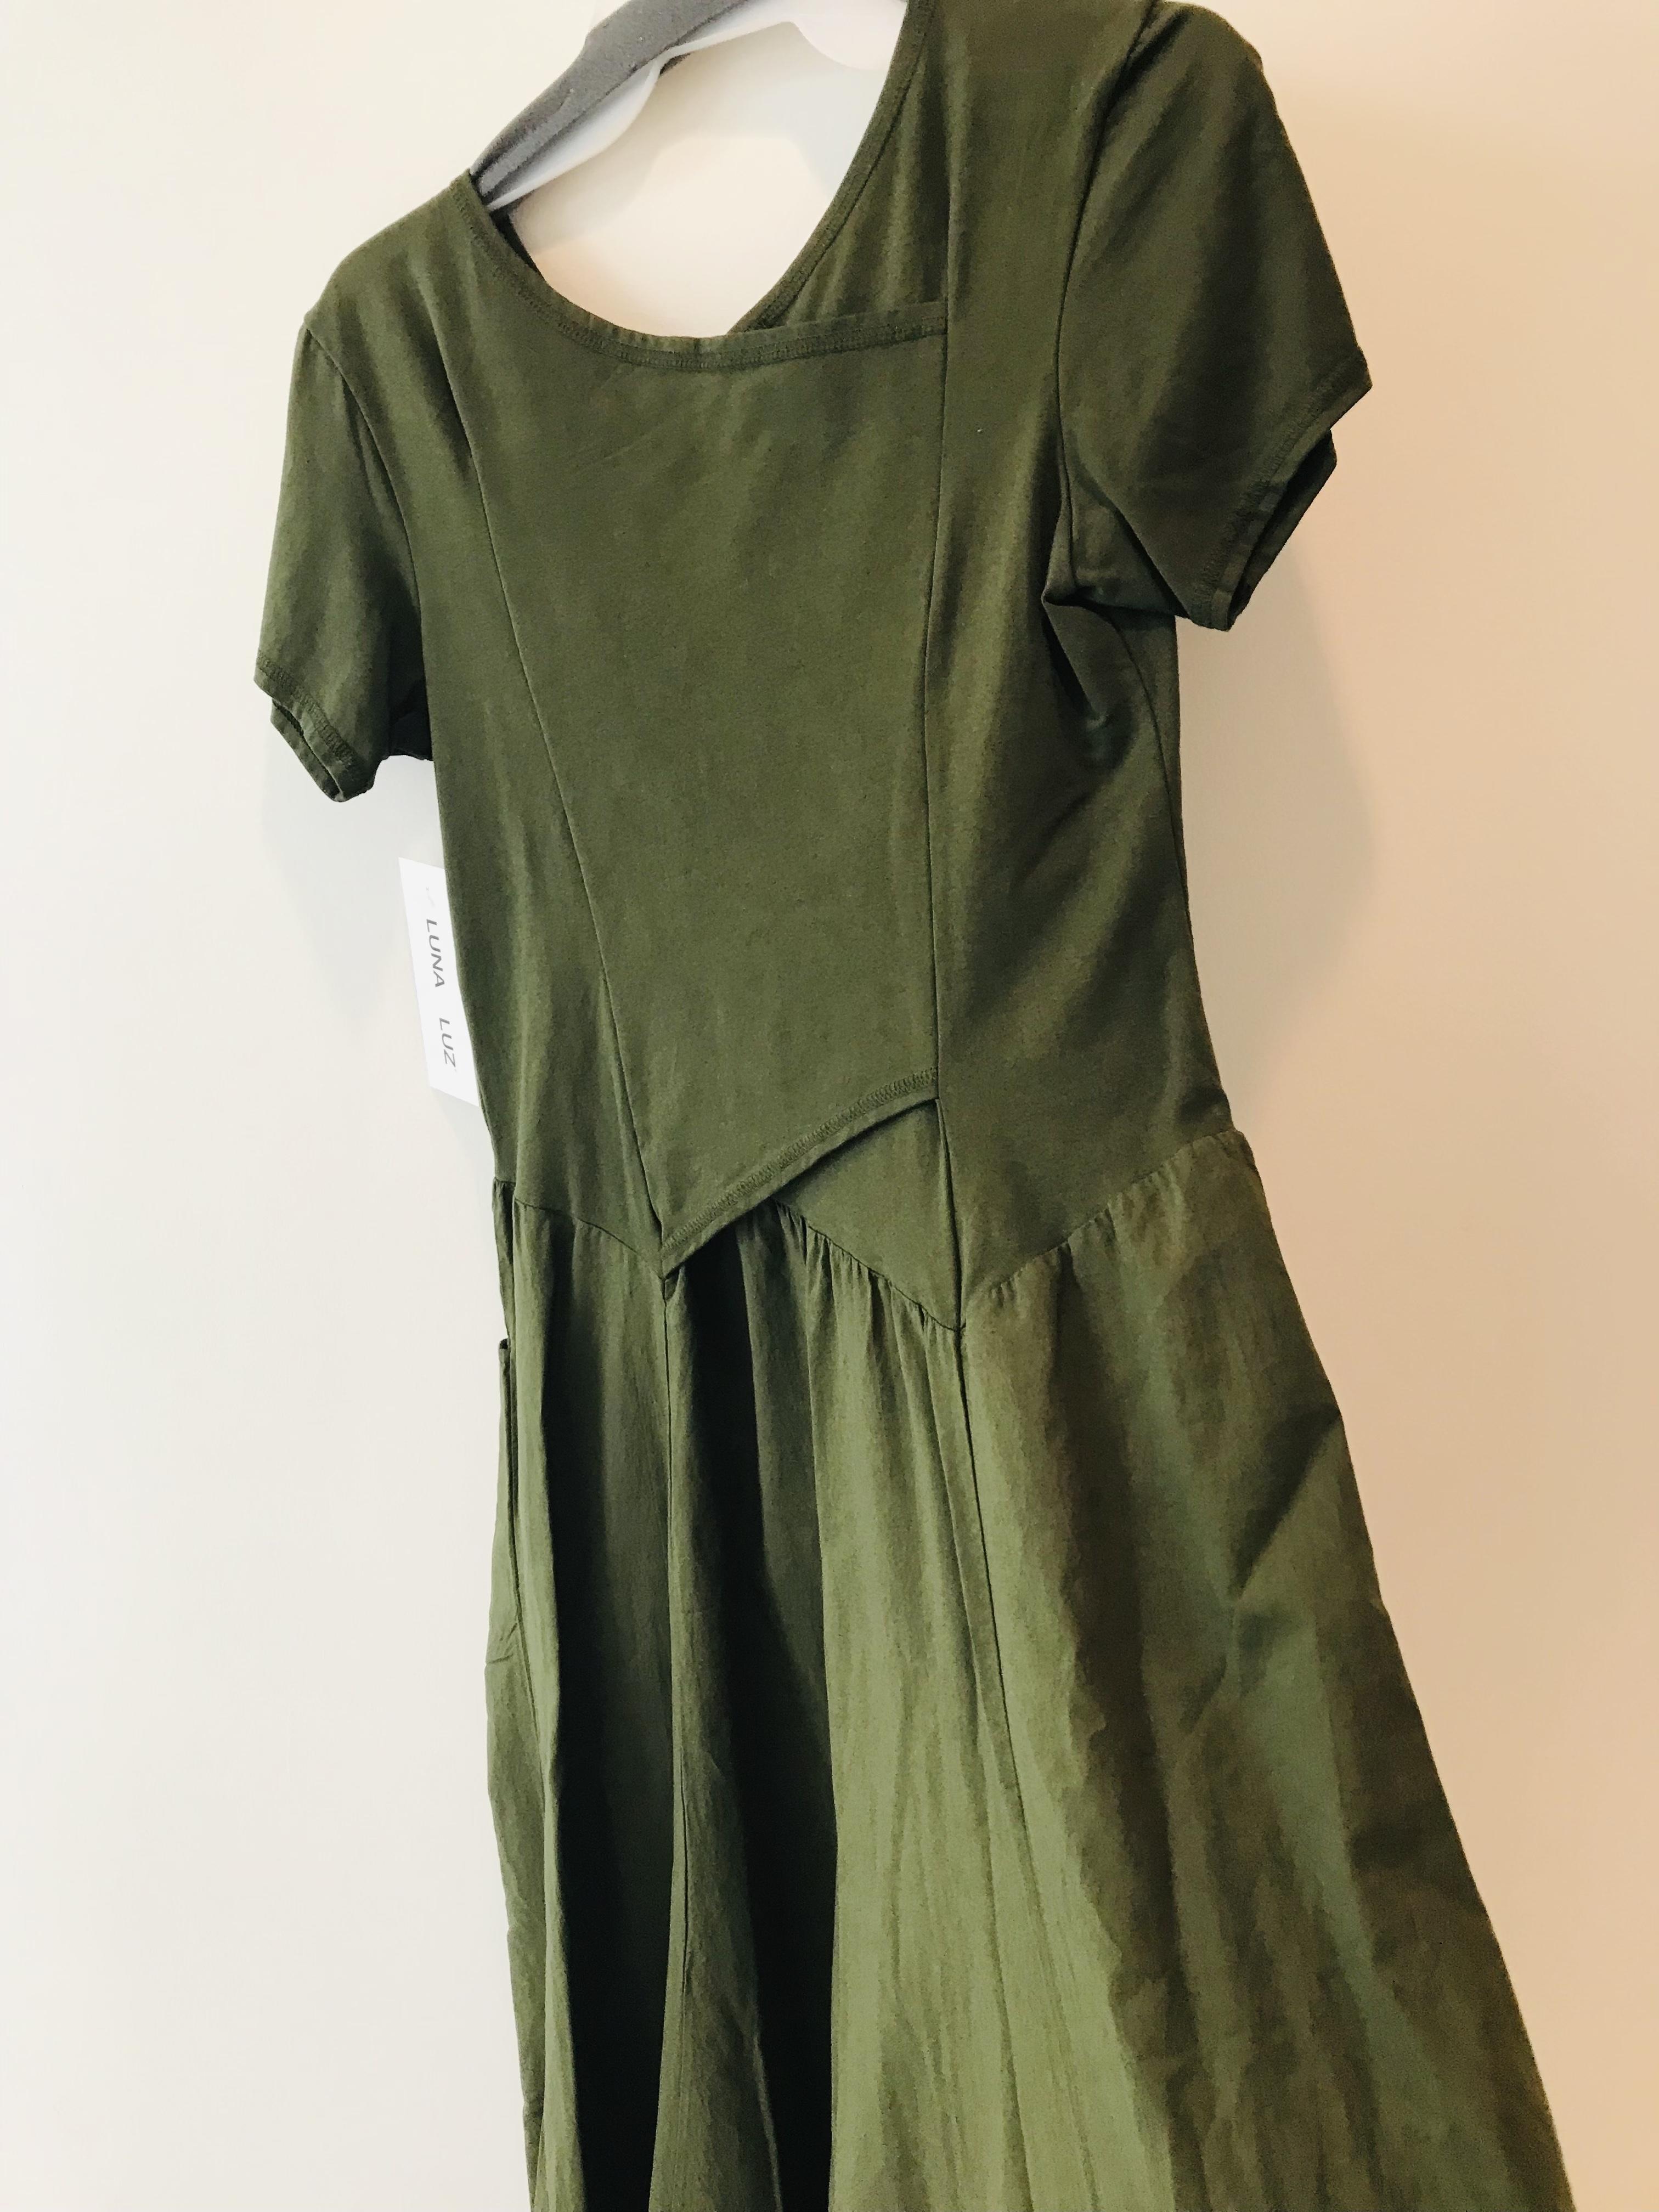 Luna Luz: Short Sleeve Cross Over Bodice Long Dress (More Arriving: NEW Fall Color - Olive!)